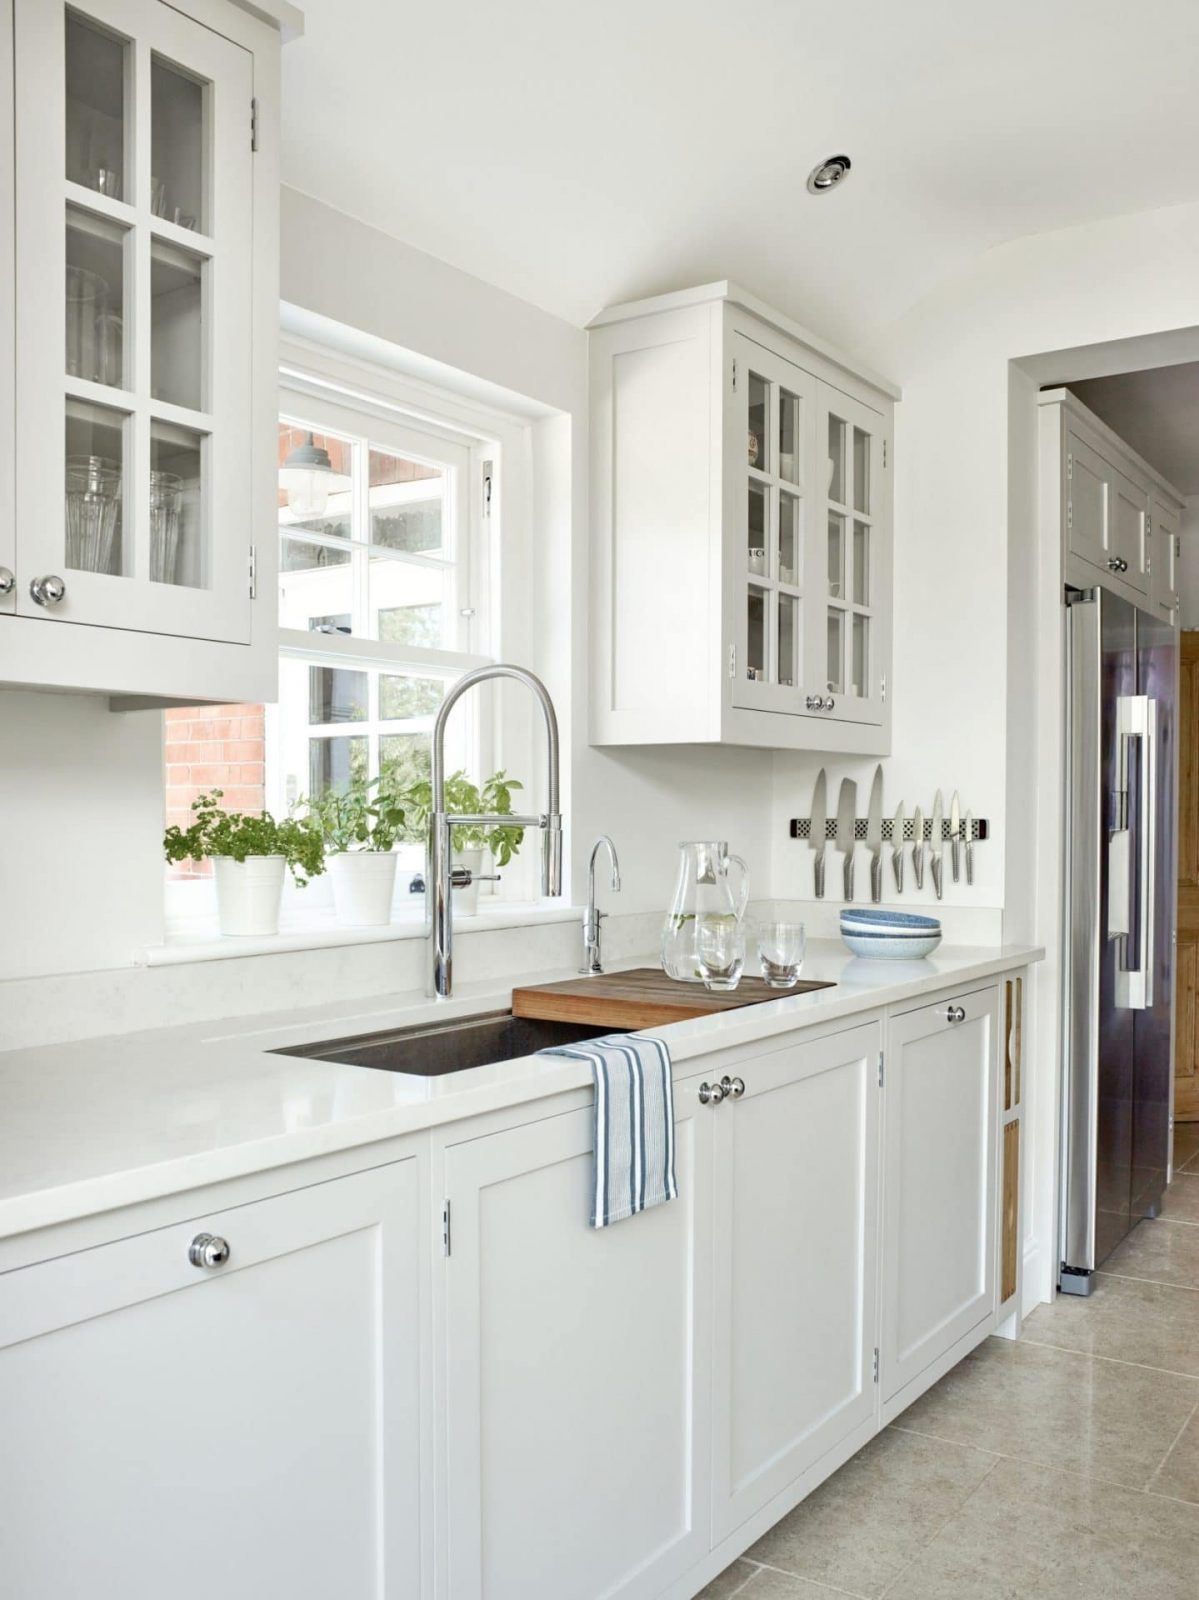 Warfield Berkshire Framed Painted Shaker Kitchen In 2020 Shaker Kitchen Kitchen Paint Shakers